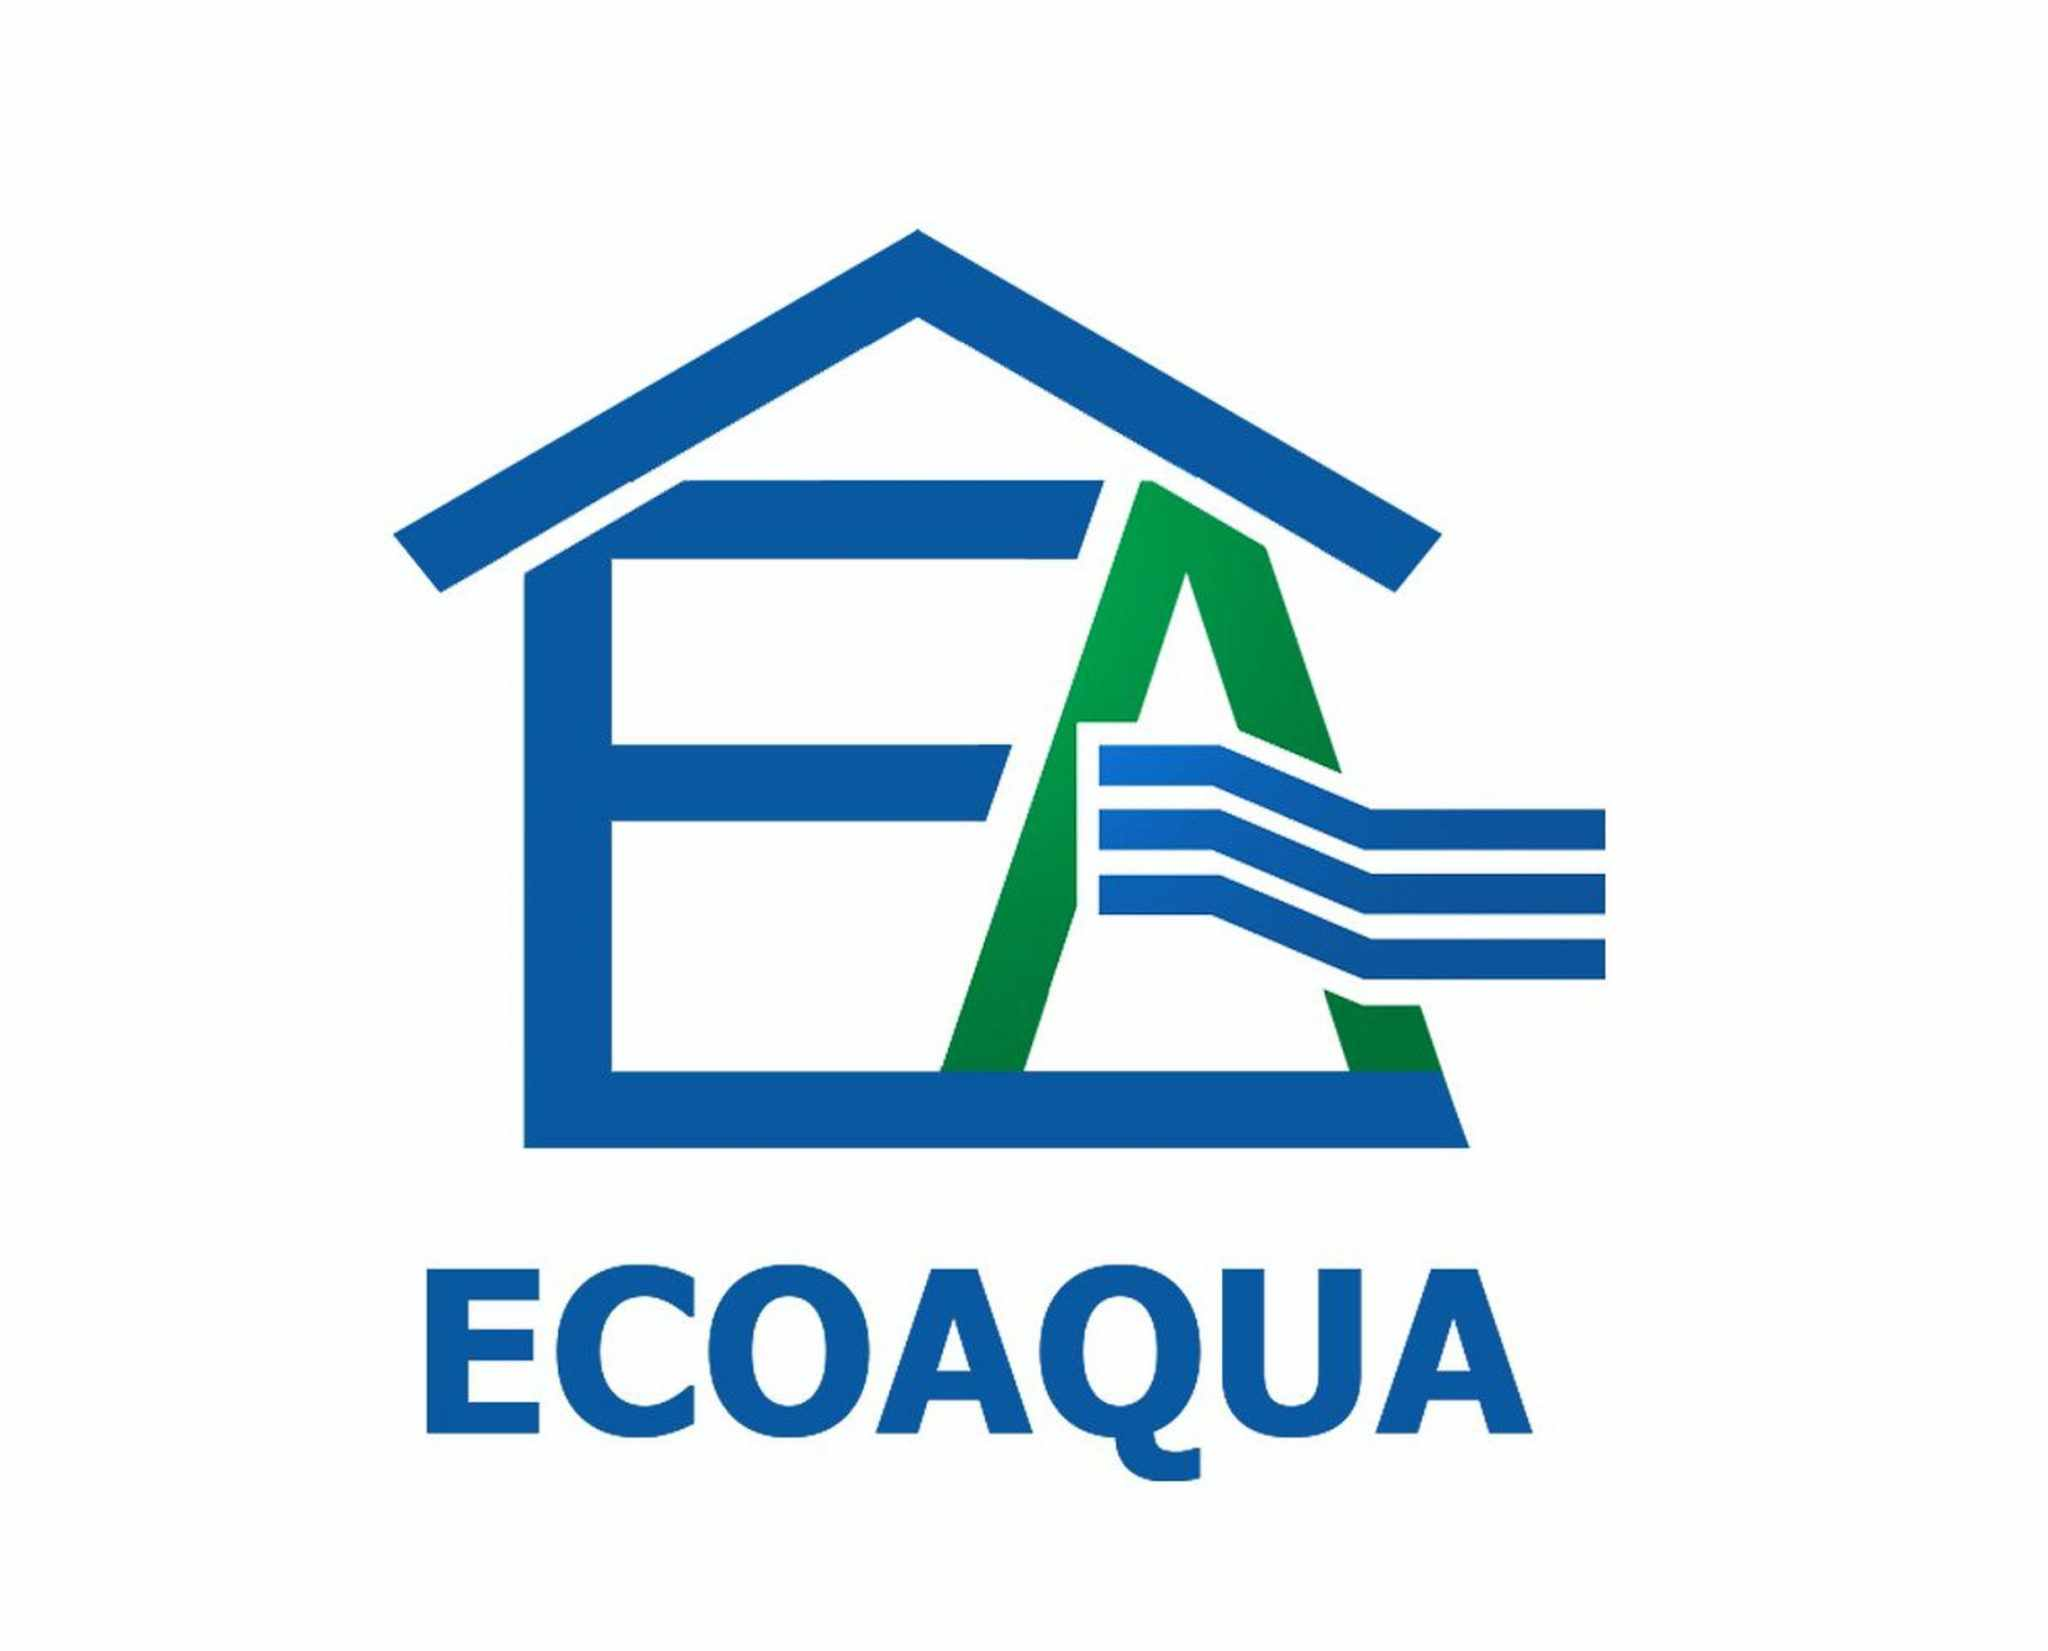 ecoaqa